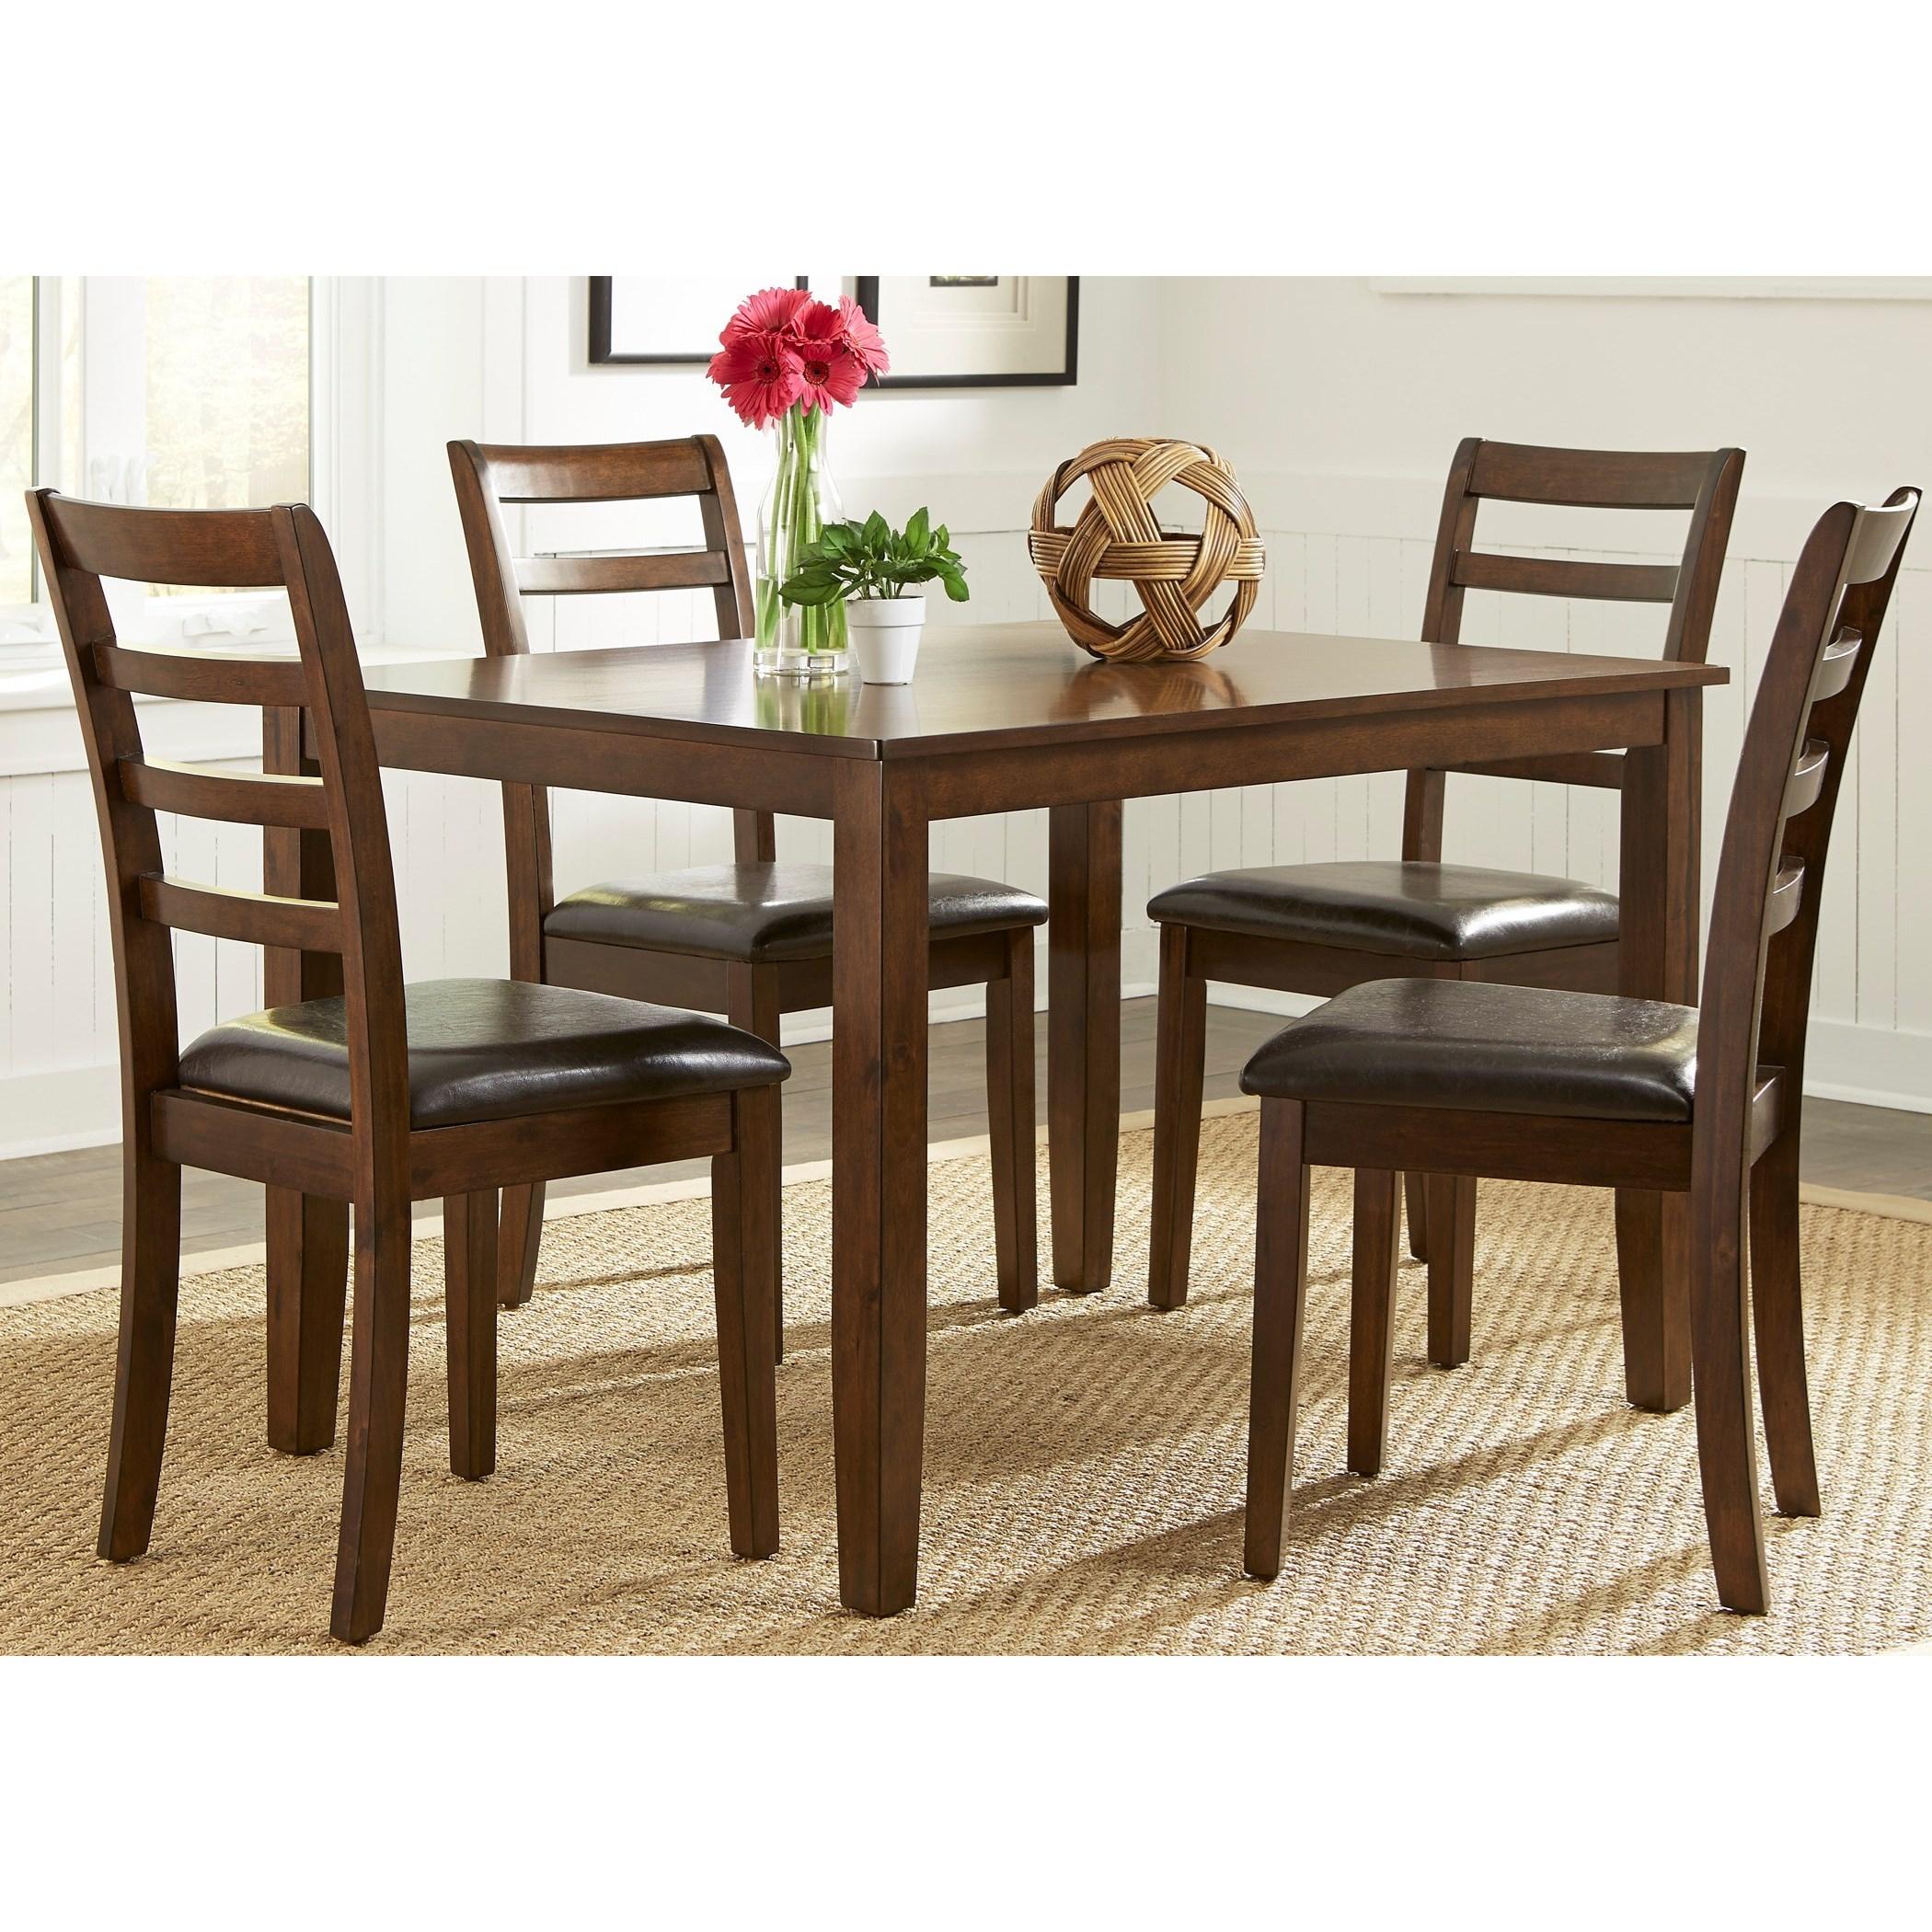 Bradshaw casual dining 5 piece rectangular leg table set for Casual dining table set